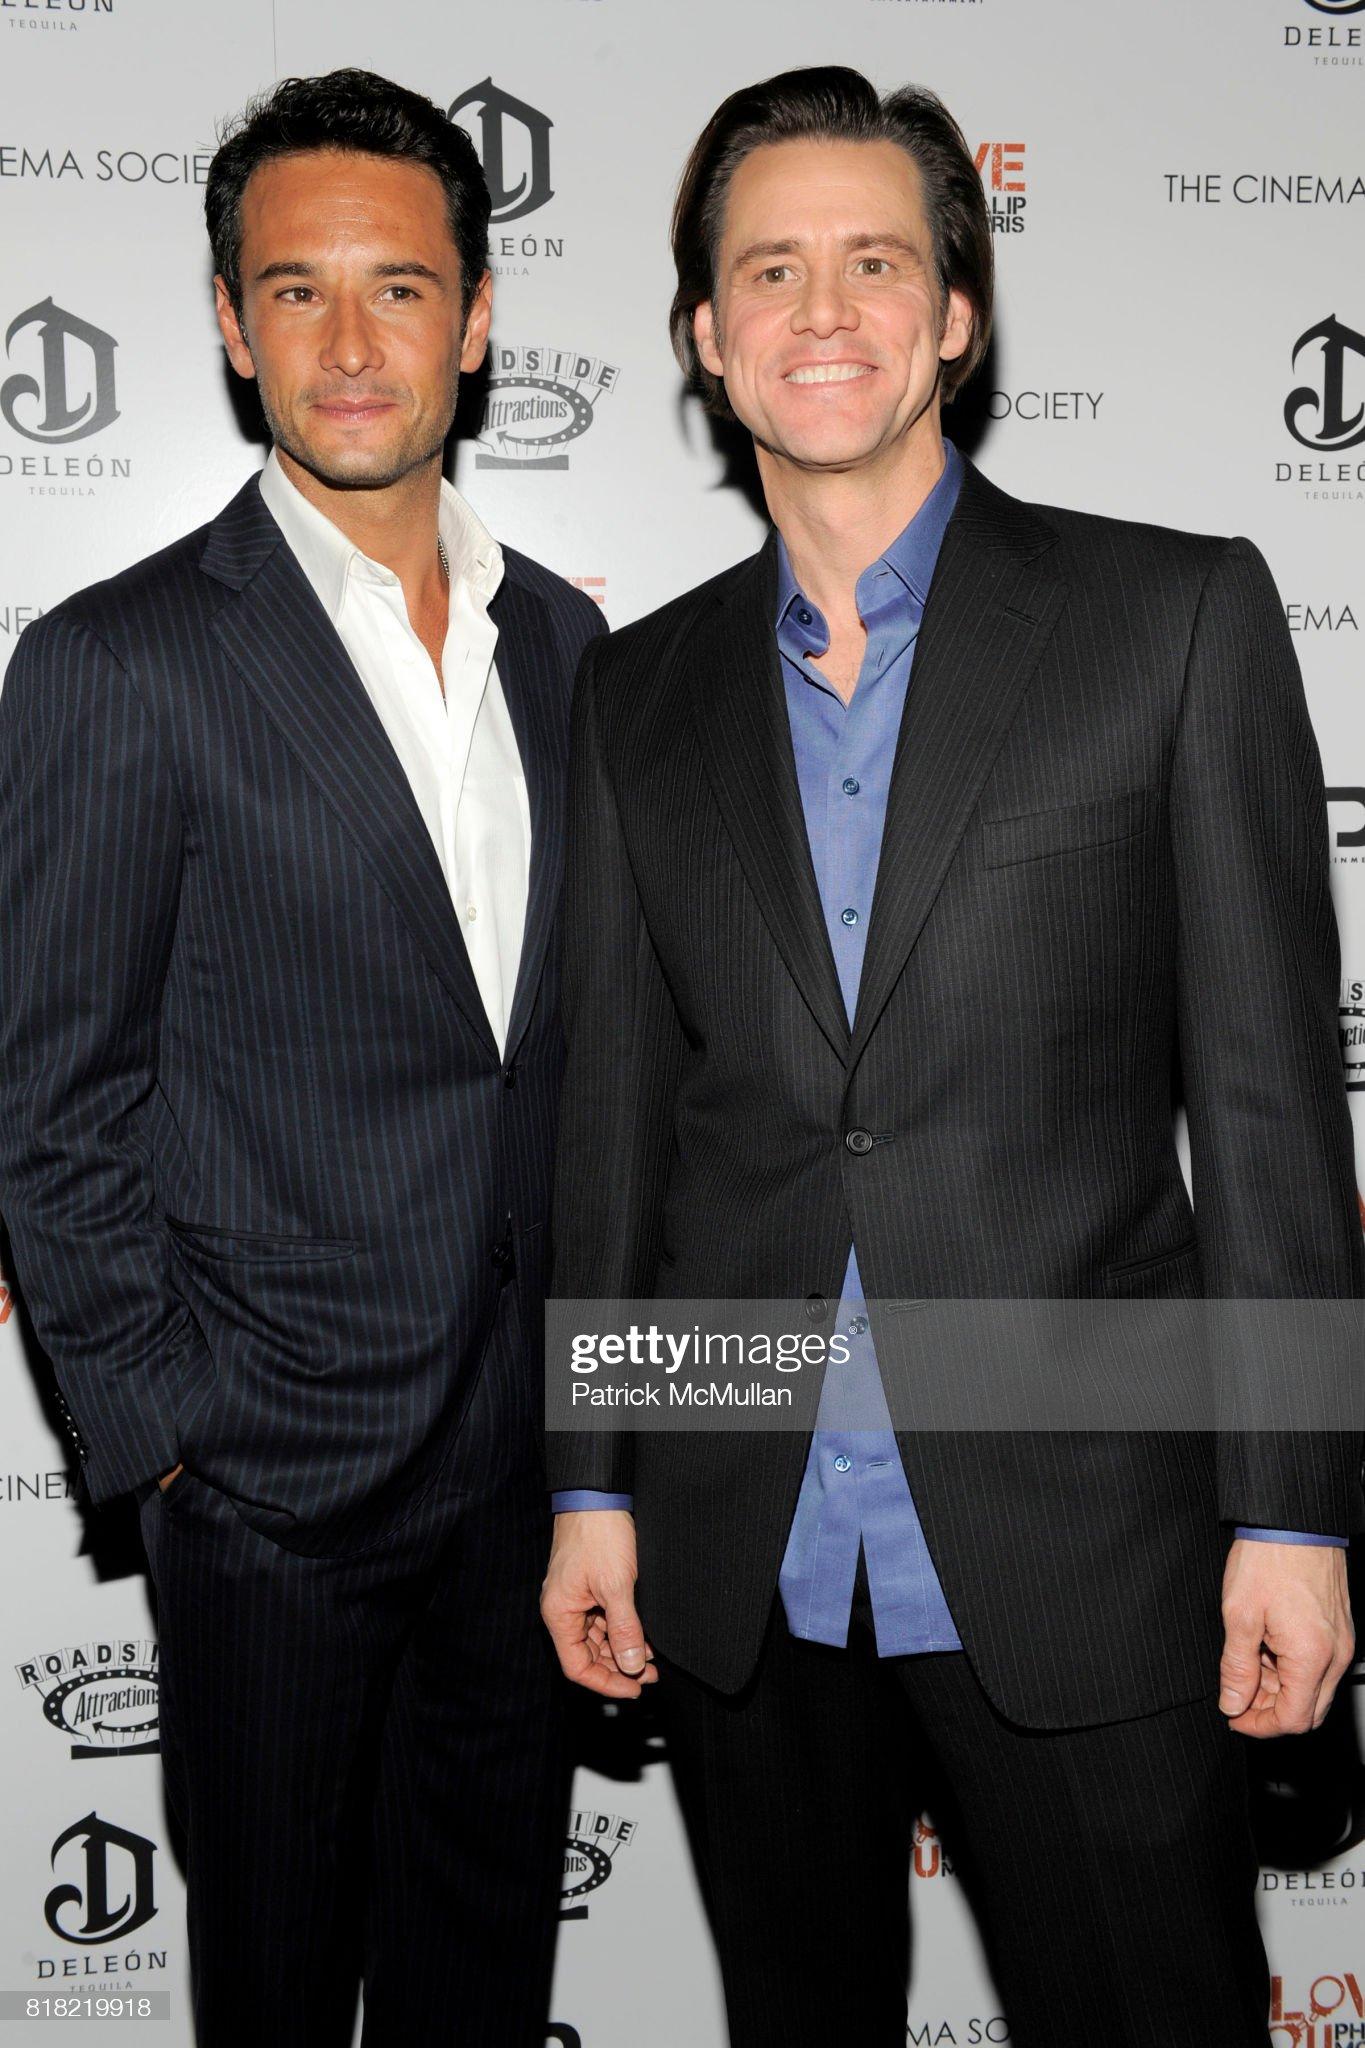 ¿Cuánto mide Rodrigo Santoro? - Altura - Real height Rodrigo-santoro-and-jim-carrey-attend-the-cinema-society-deleon-host-picture-id818219918?s=2048x2048